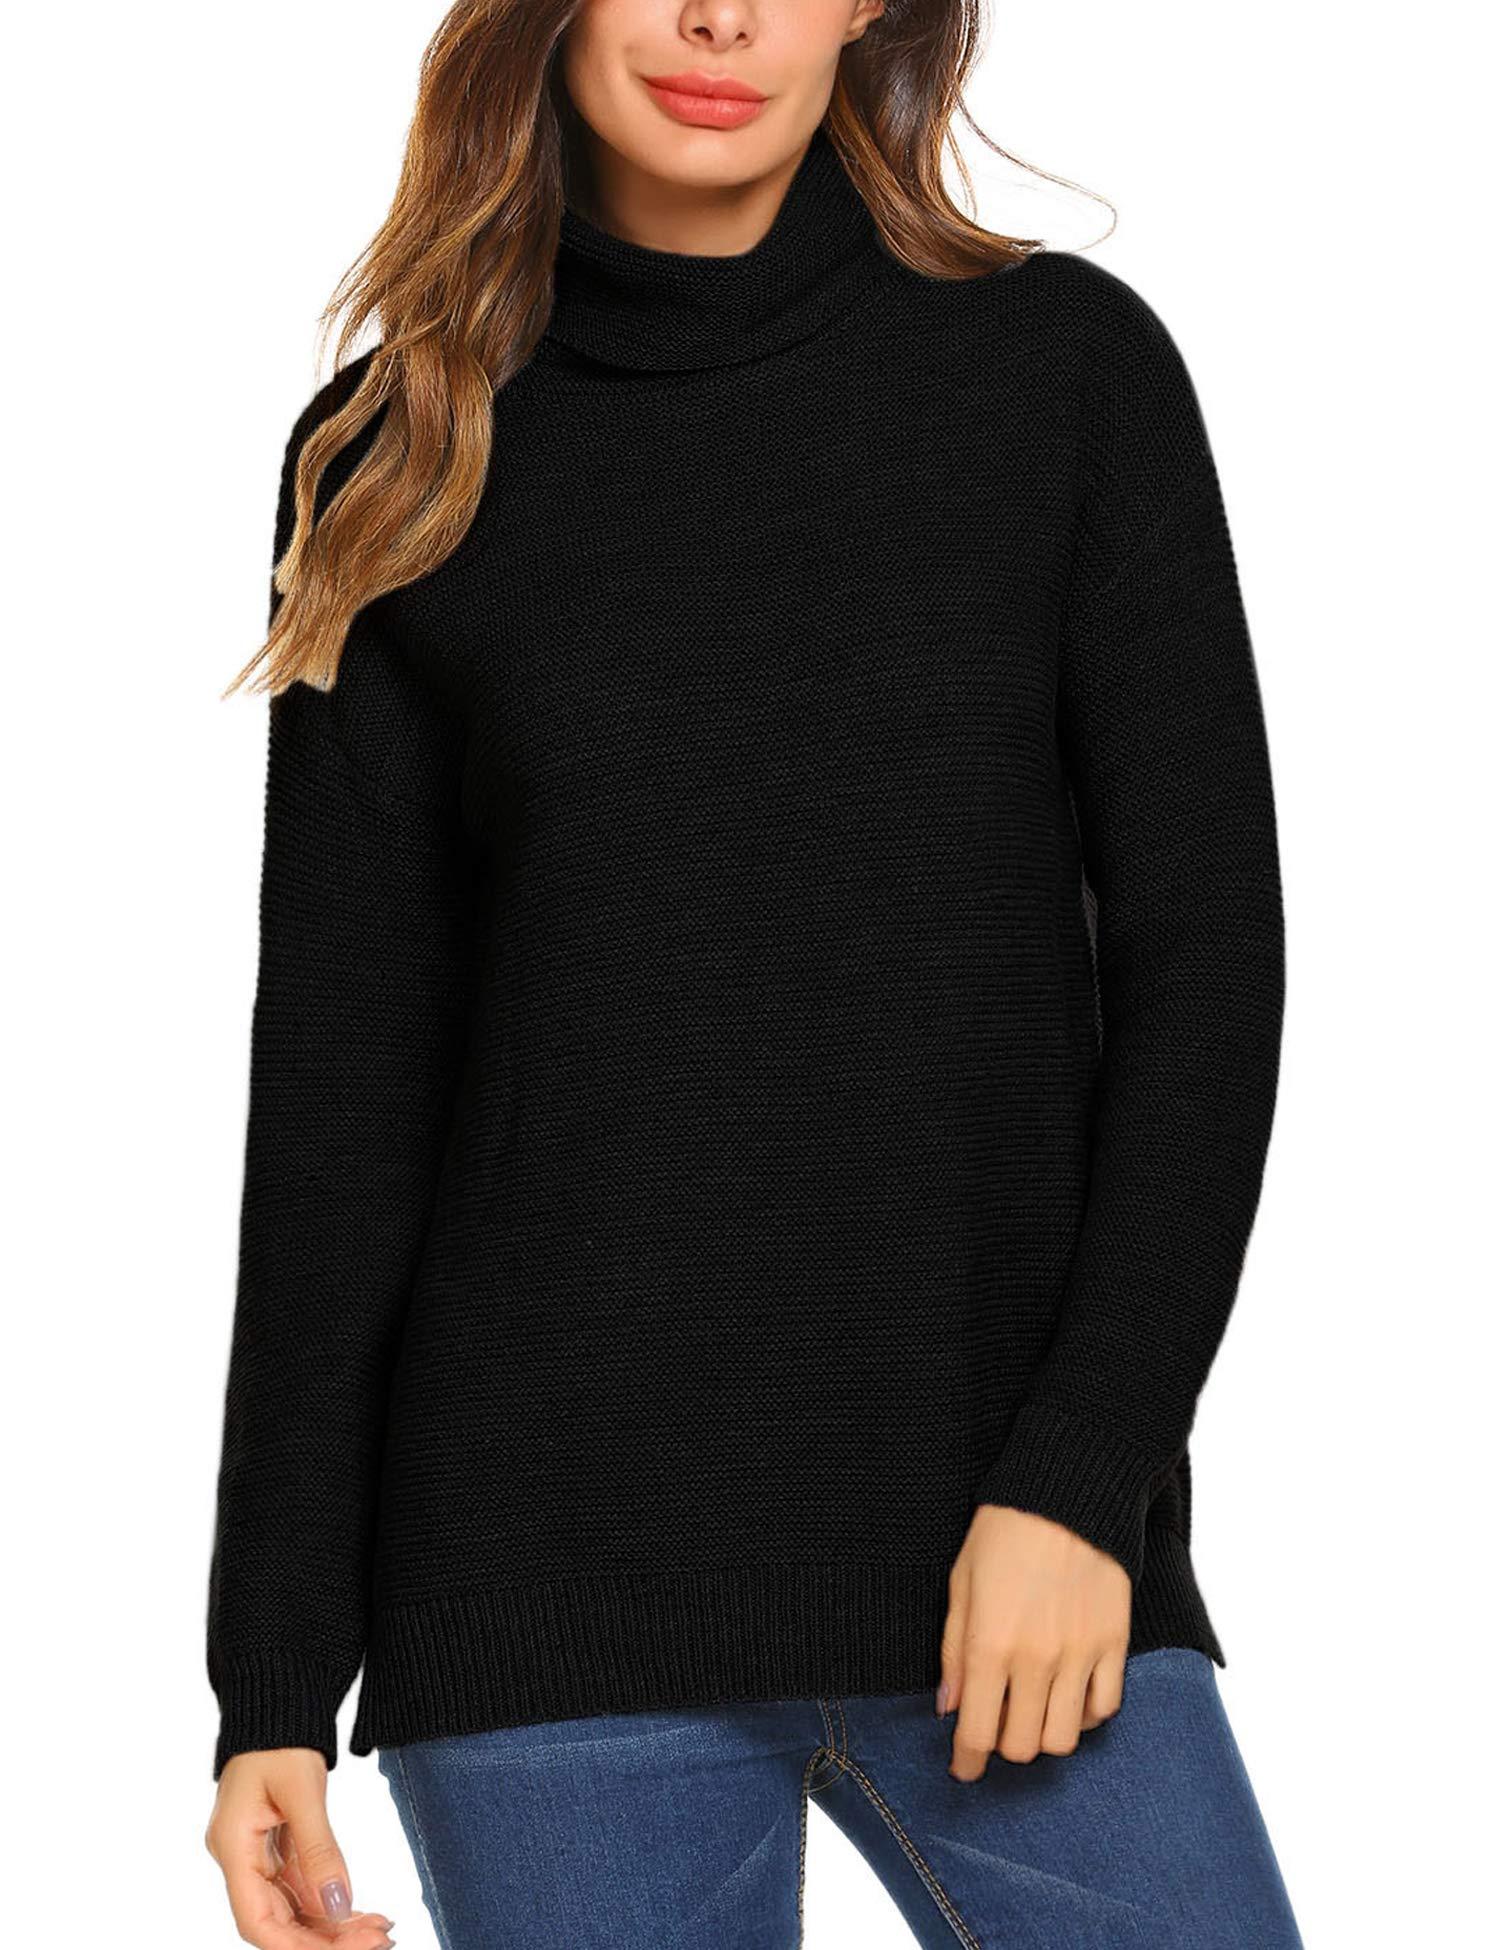 Teewanna Womens Cowl Neck Sweater Oversized Knit Long Sleeve Sweaters Tunic Tops (Black, XL)